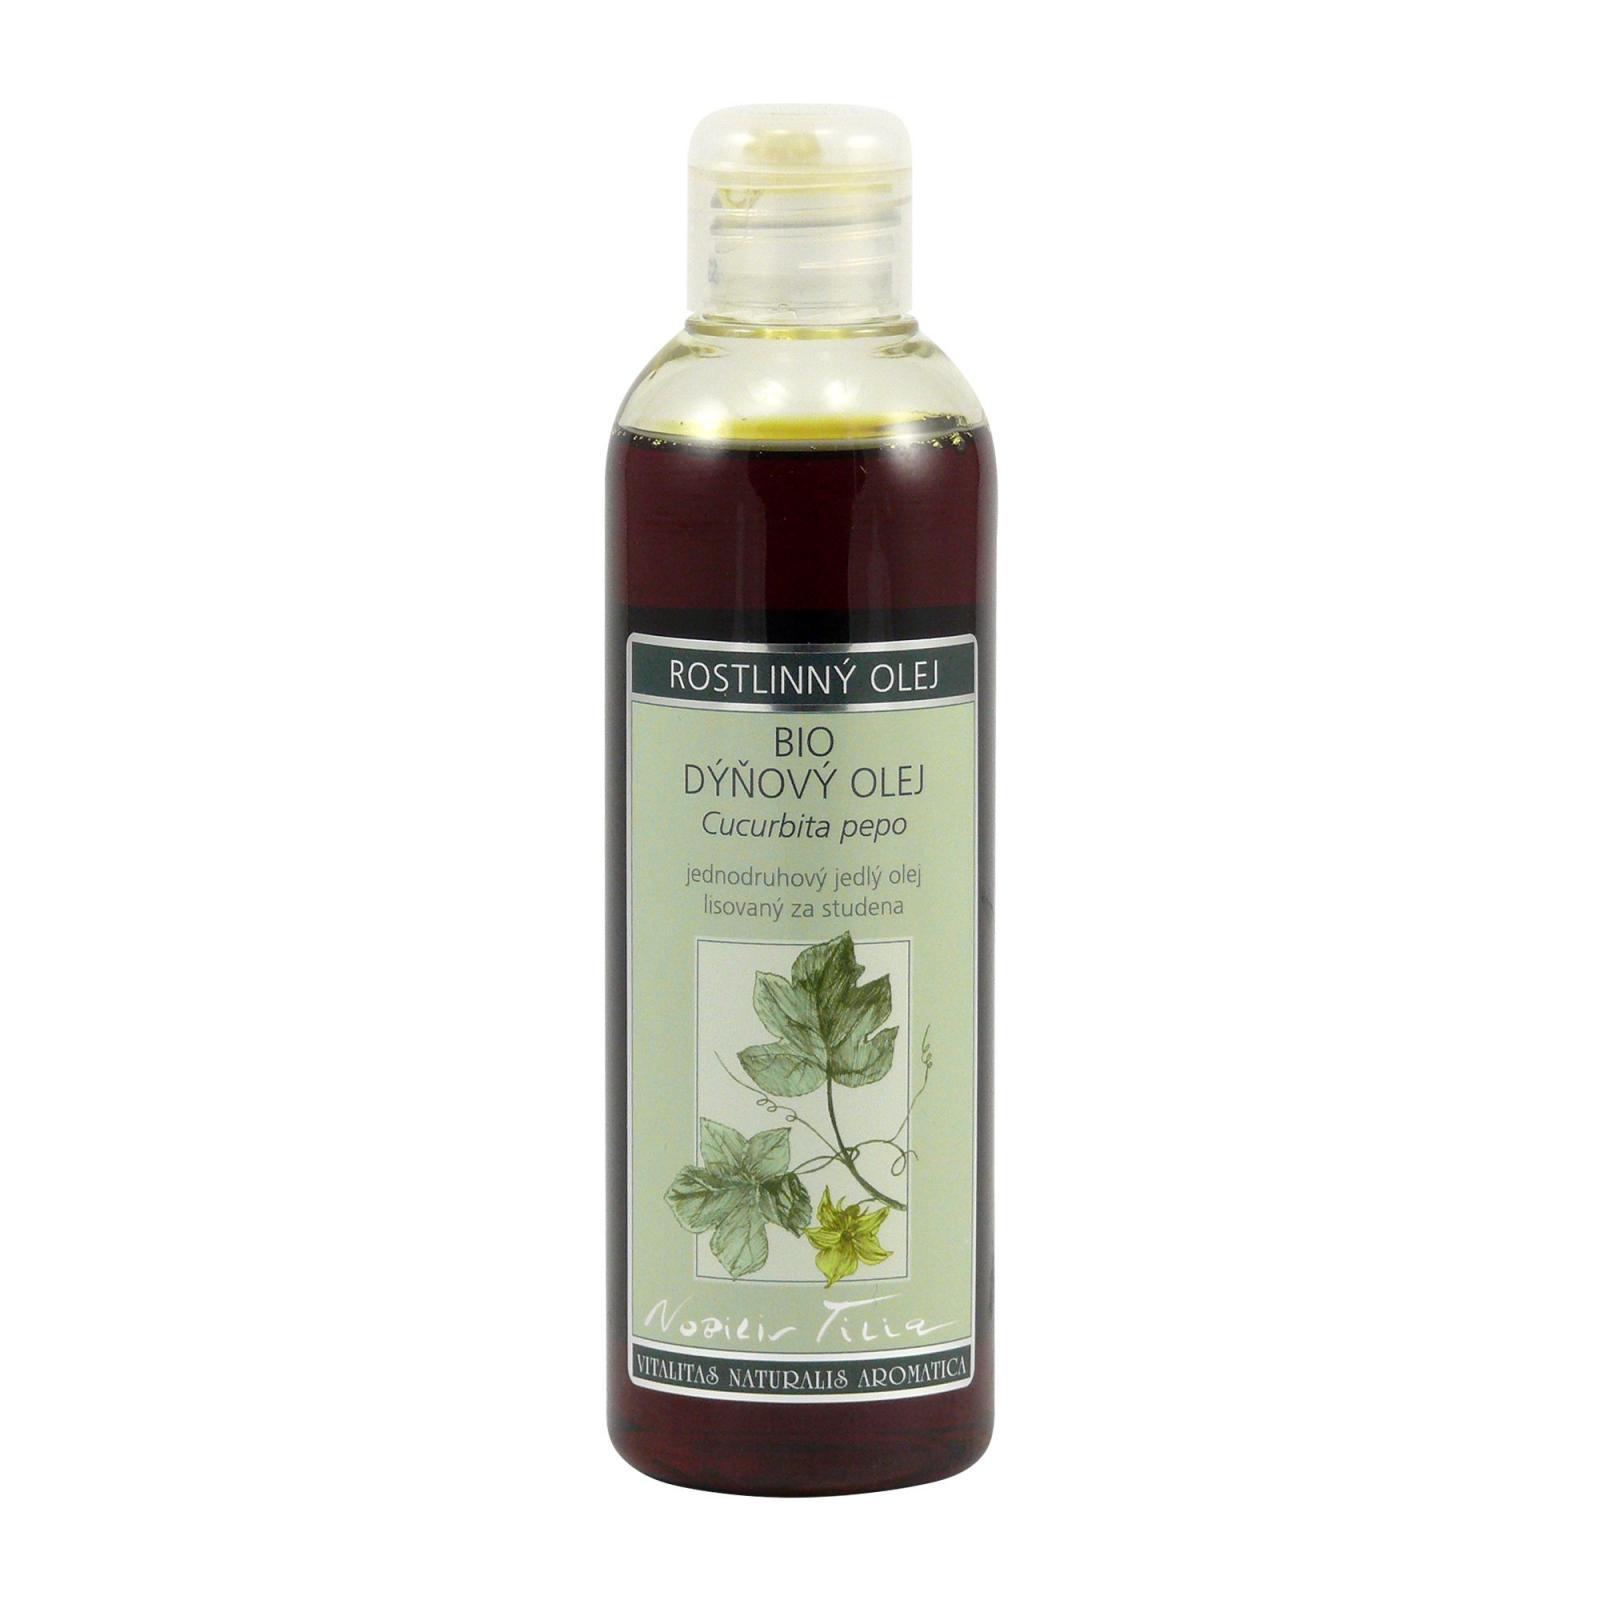 Nobilis Tilia Dýňový olej, bio 200 ml